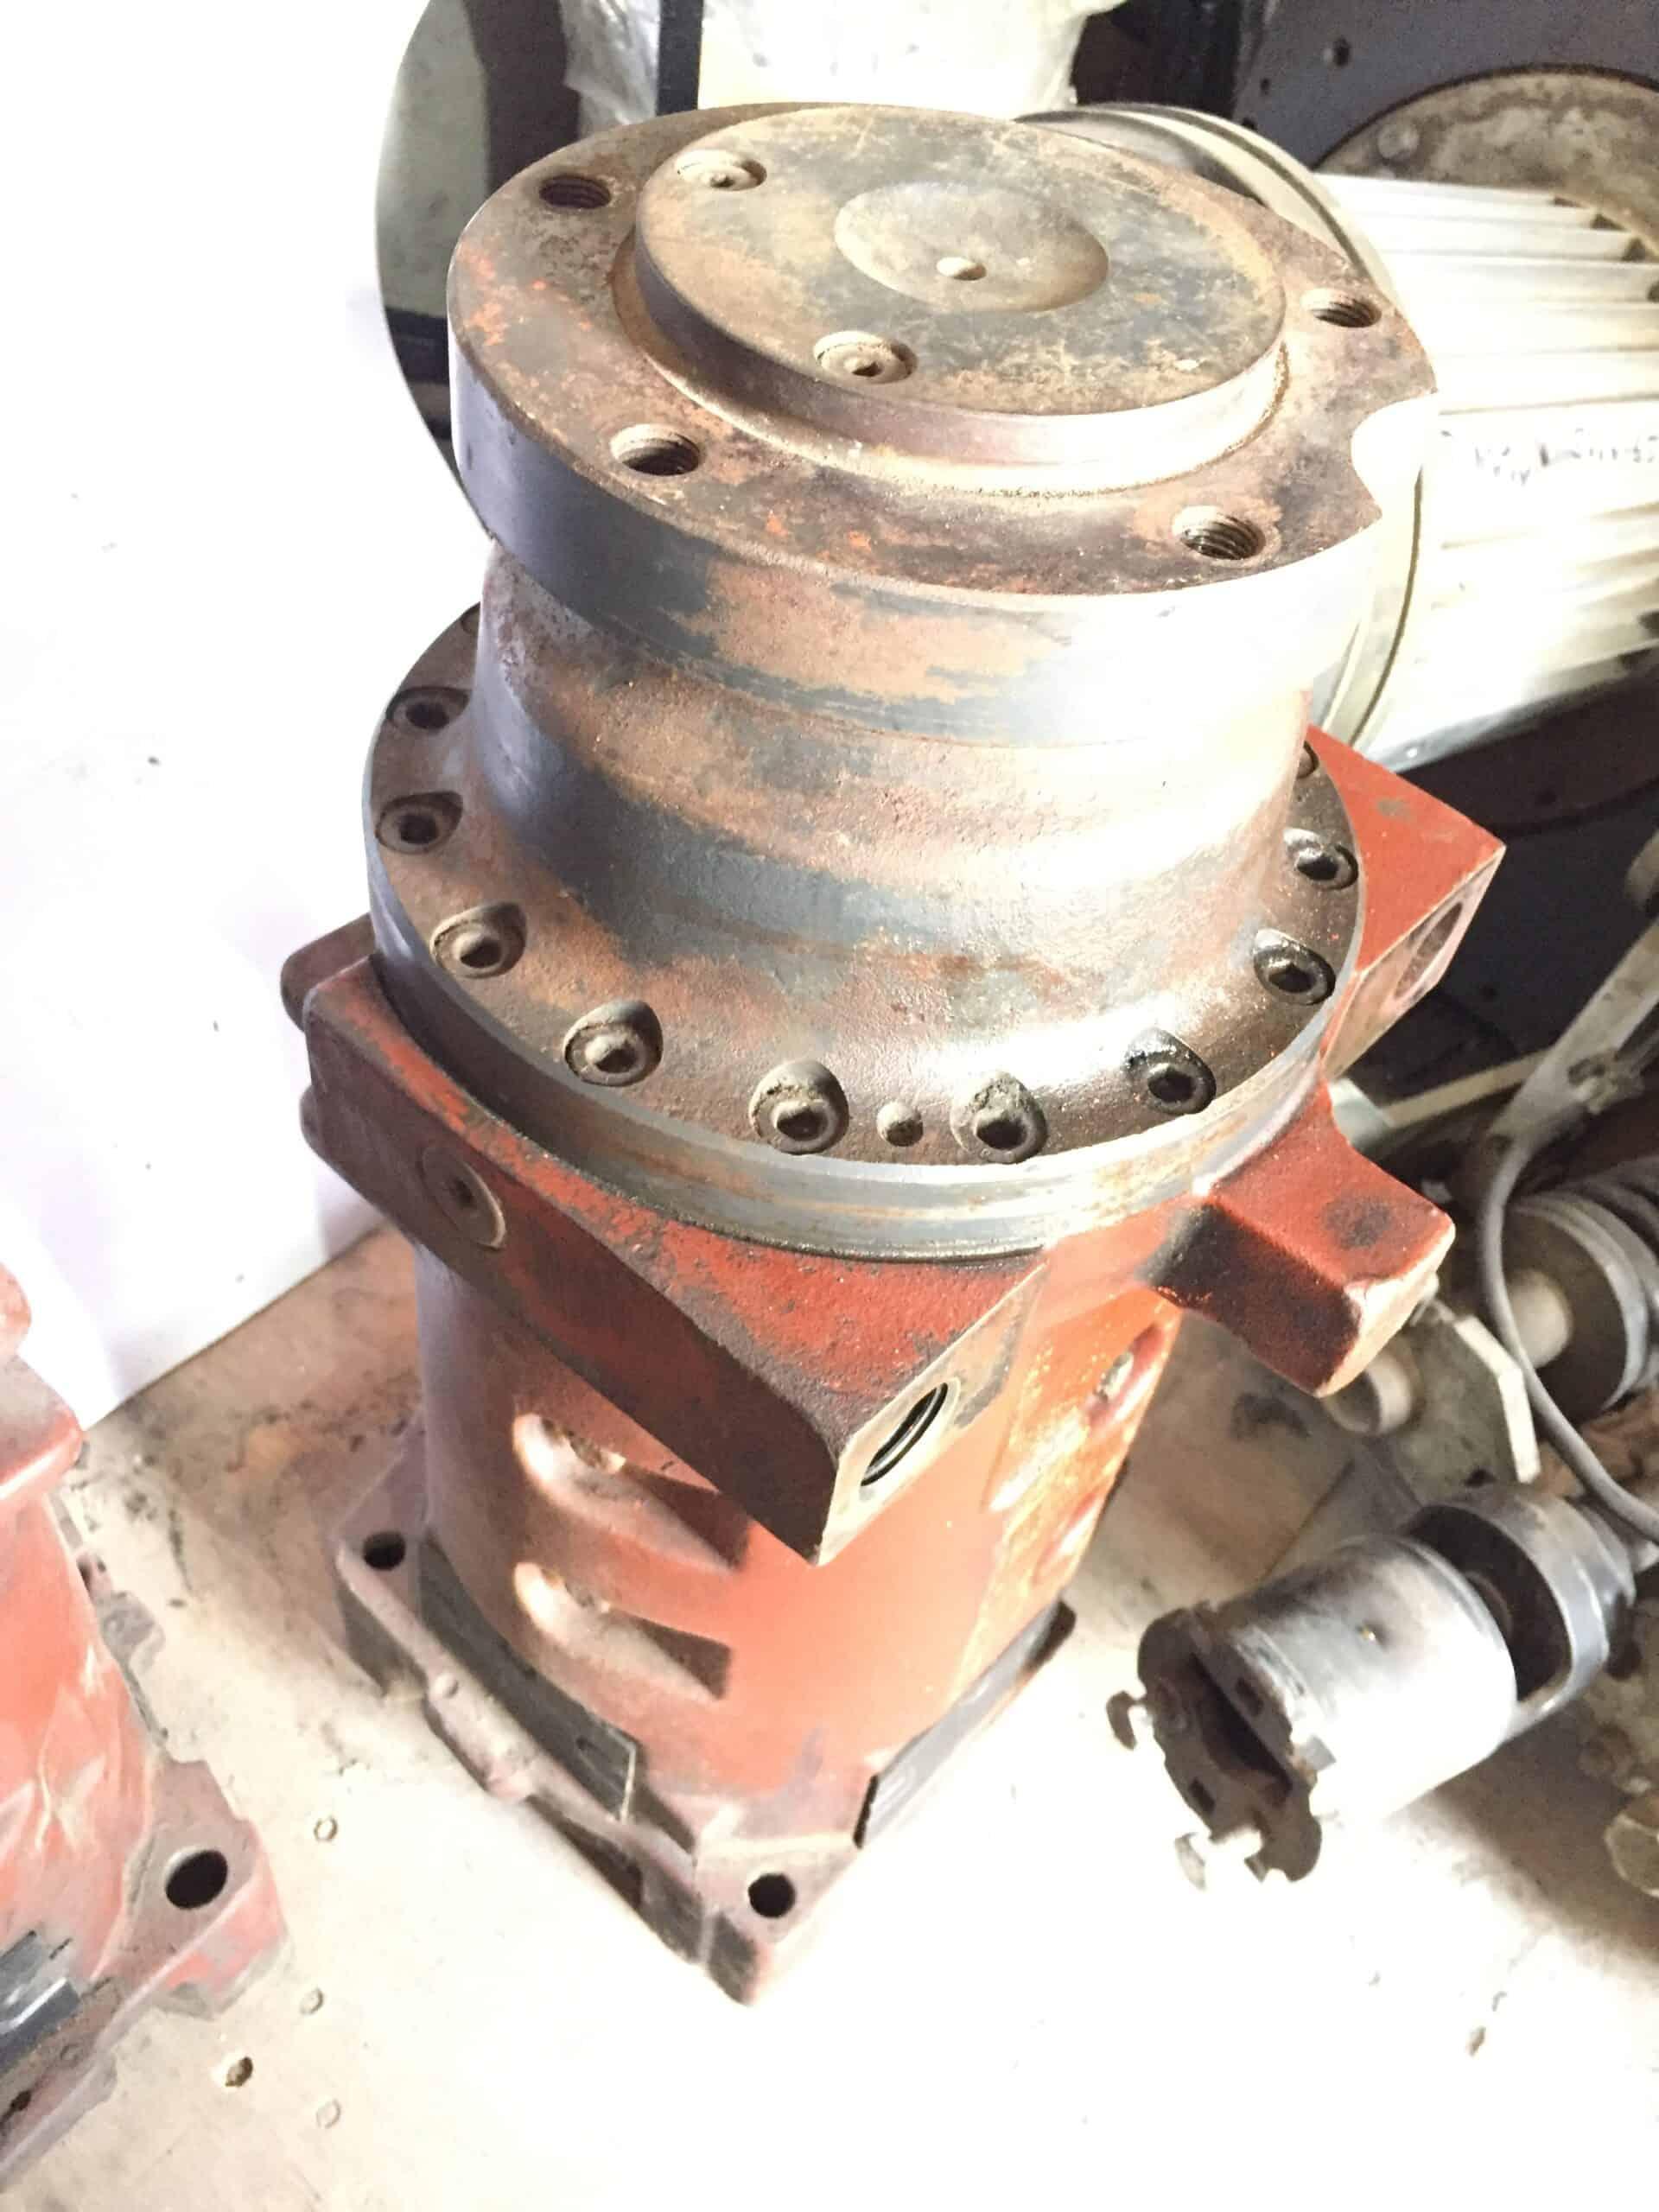   Traction motor Assy- Right   Fazl-e-Rasheed and Company August 2021